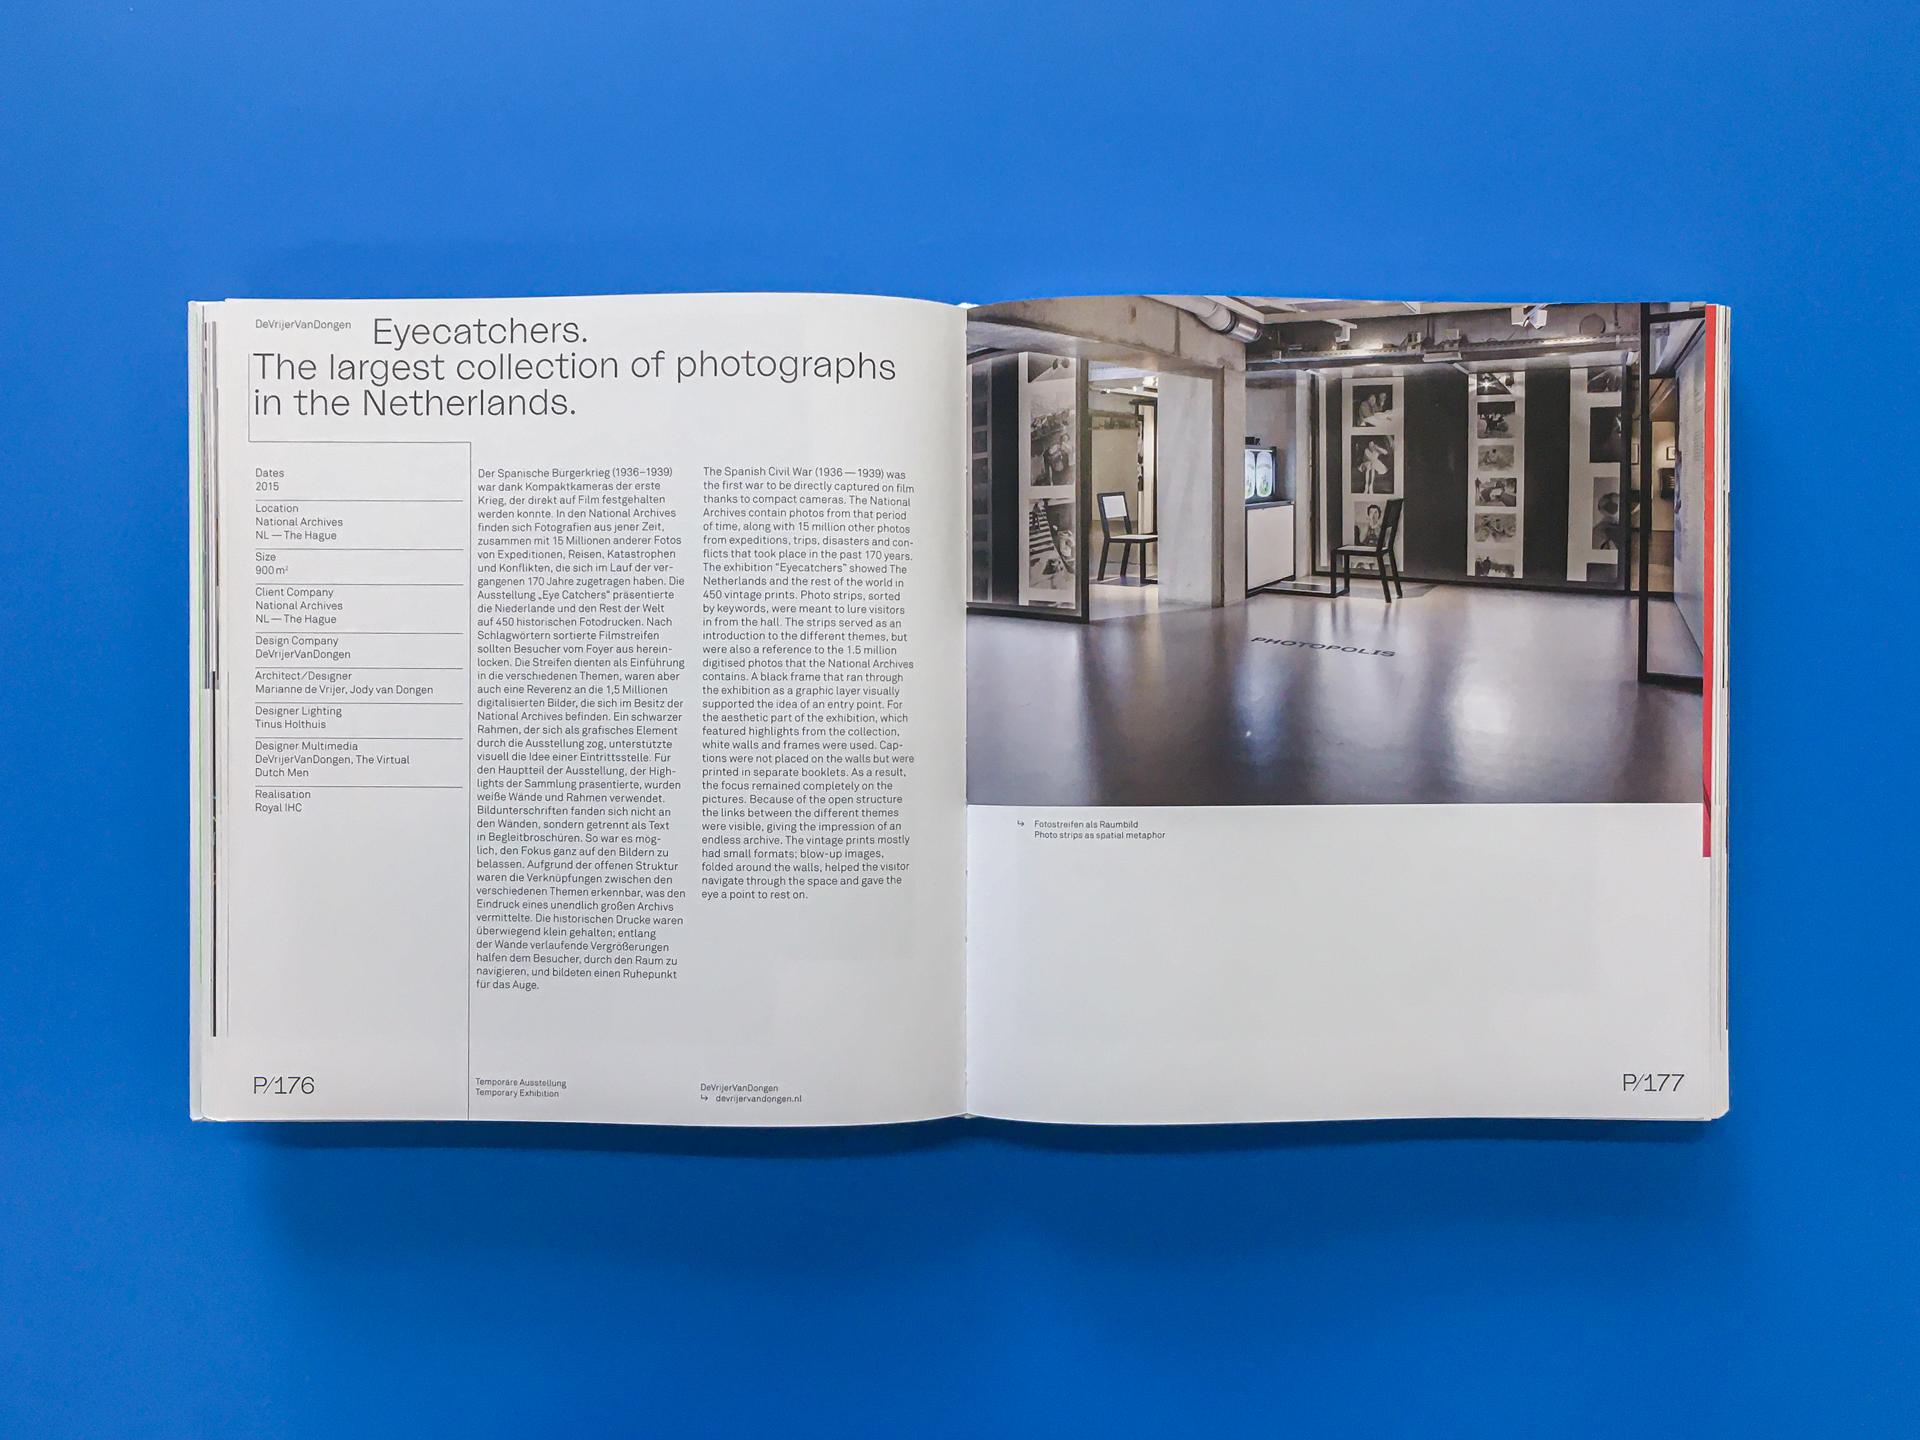 dvvd na new exhibition design 03 book 2 1 jpg